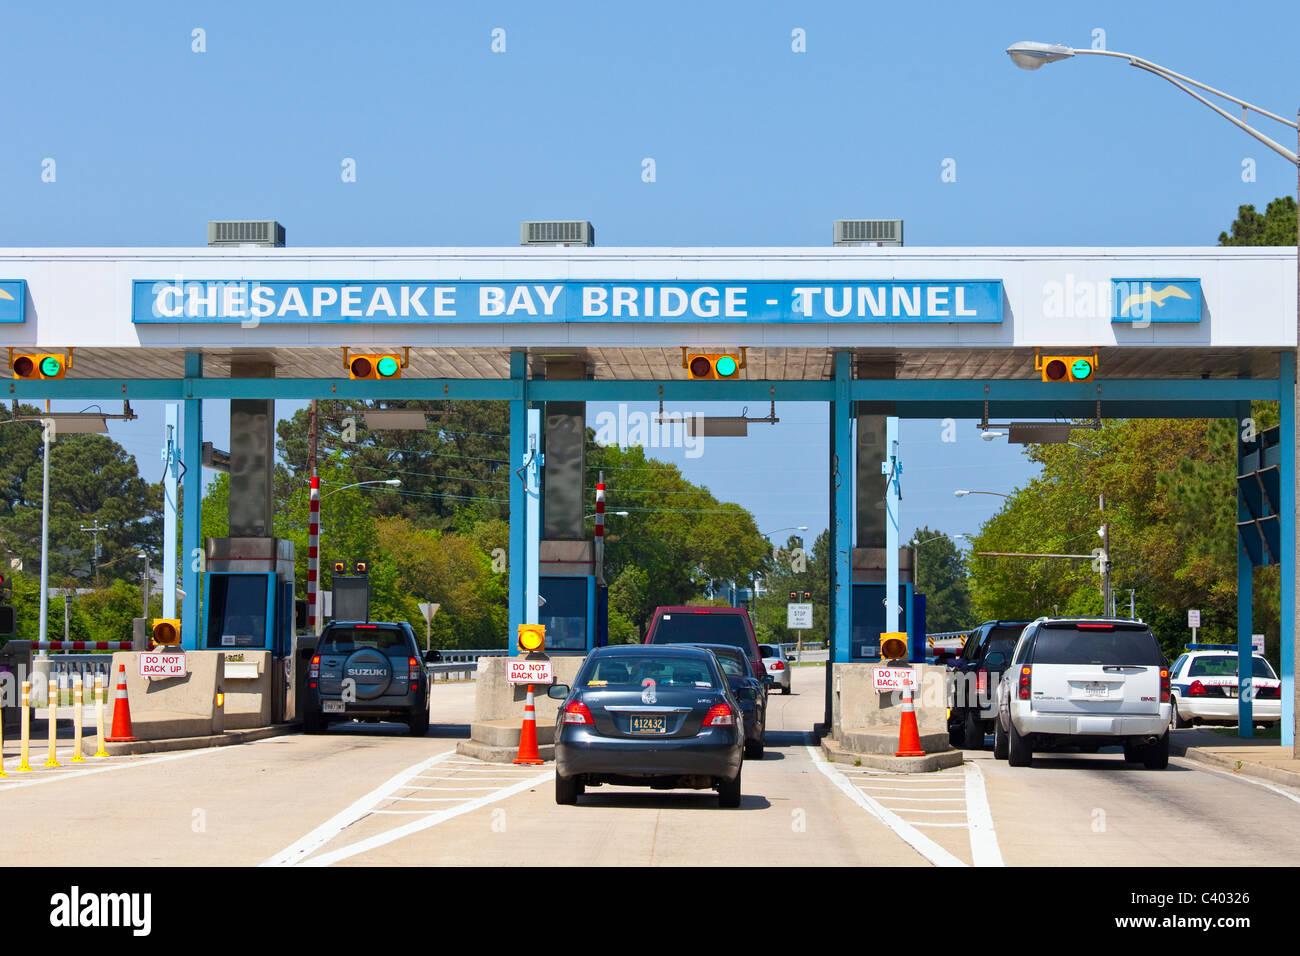 Chesapeake Bay Bridge Tunnel, Virginia - Stock Image